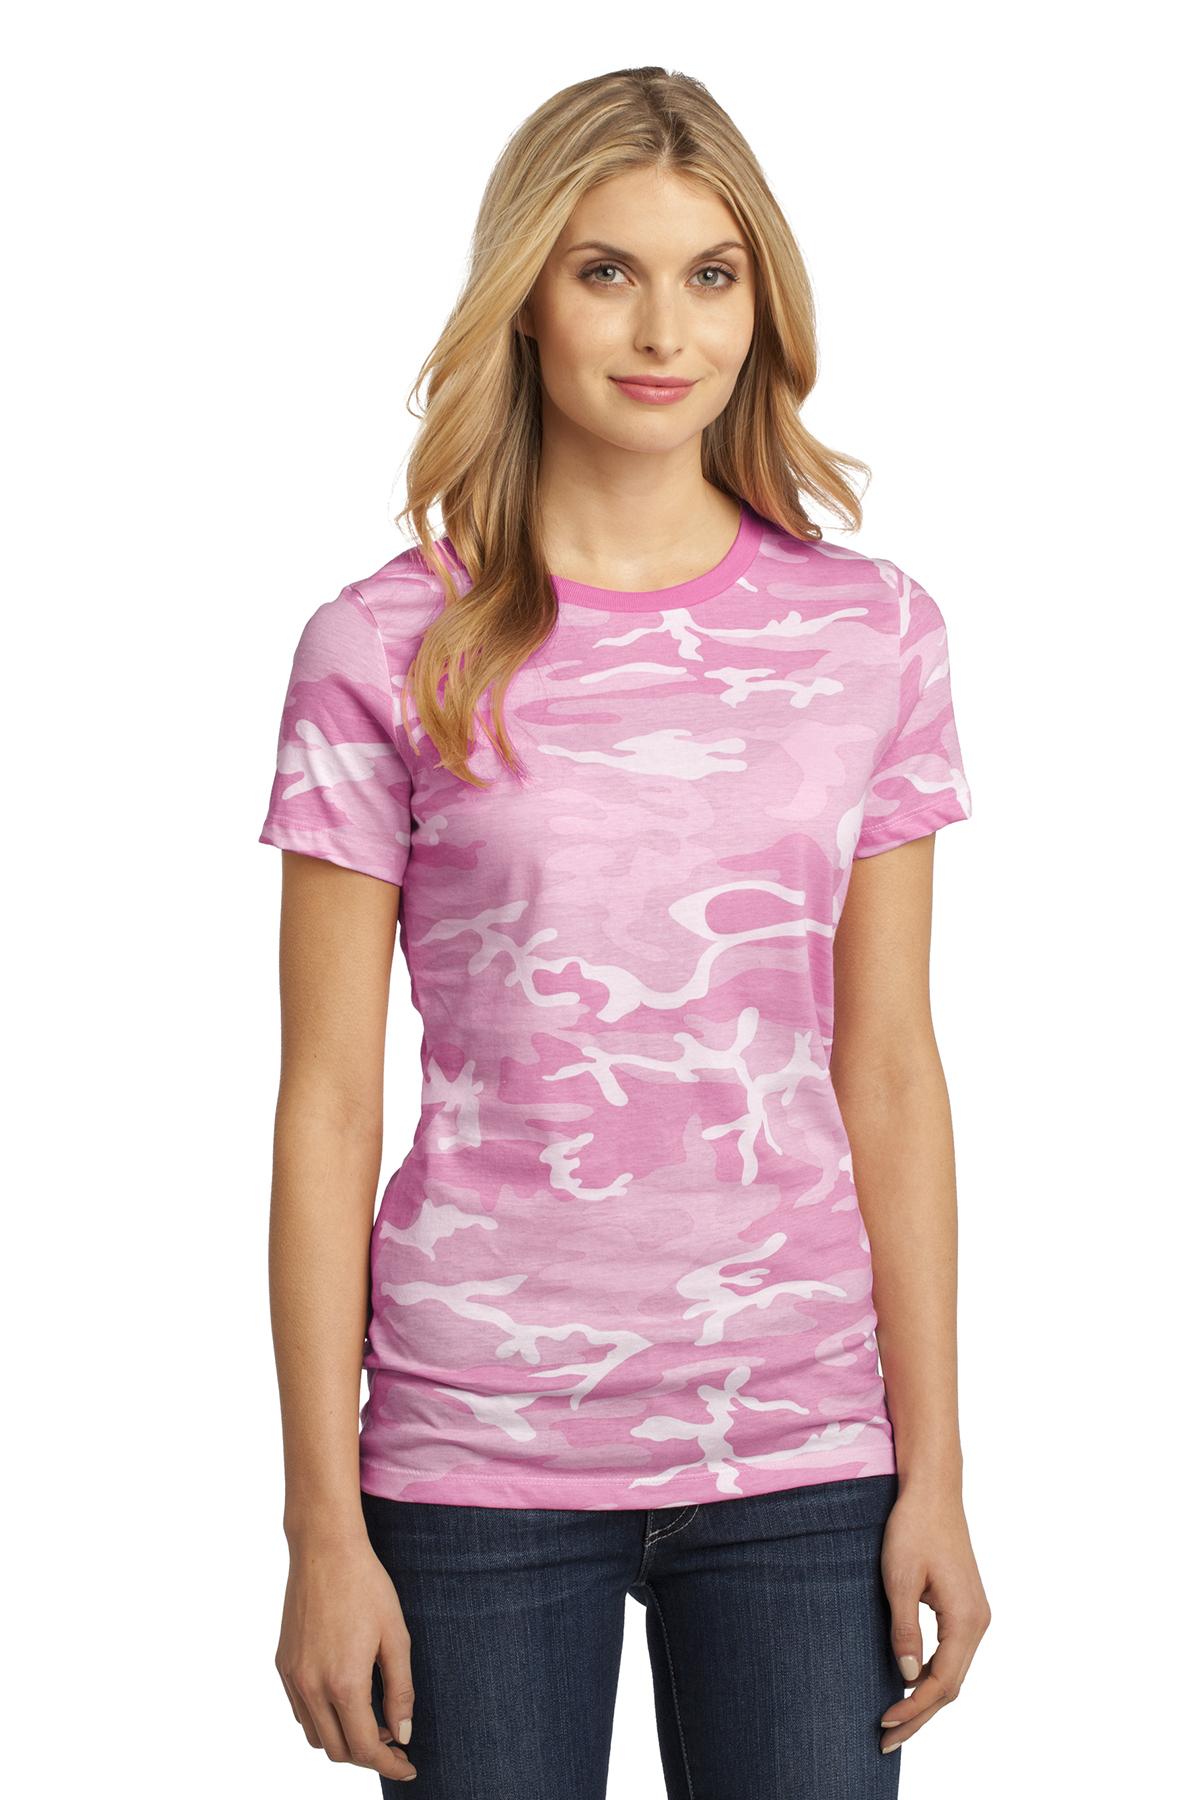 dbafdac6cfb1 District made ladies perfect weight camo crew tee cotton shirts sanmar jpg  1200x1800 Pink camo shirts